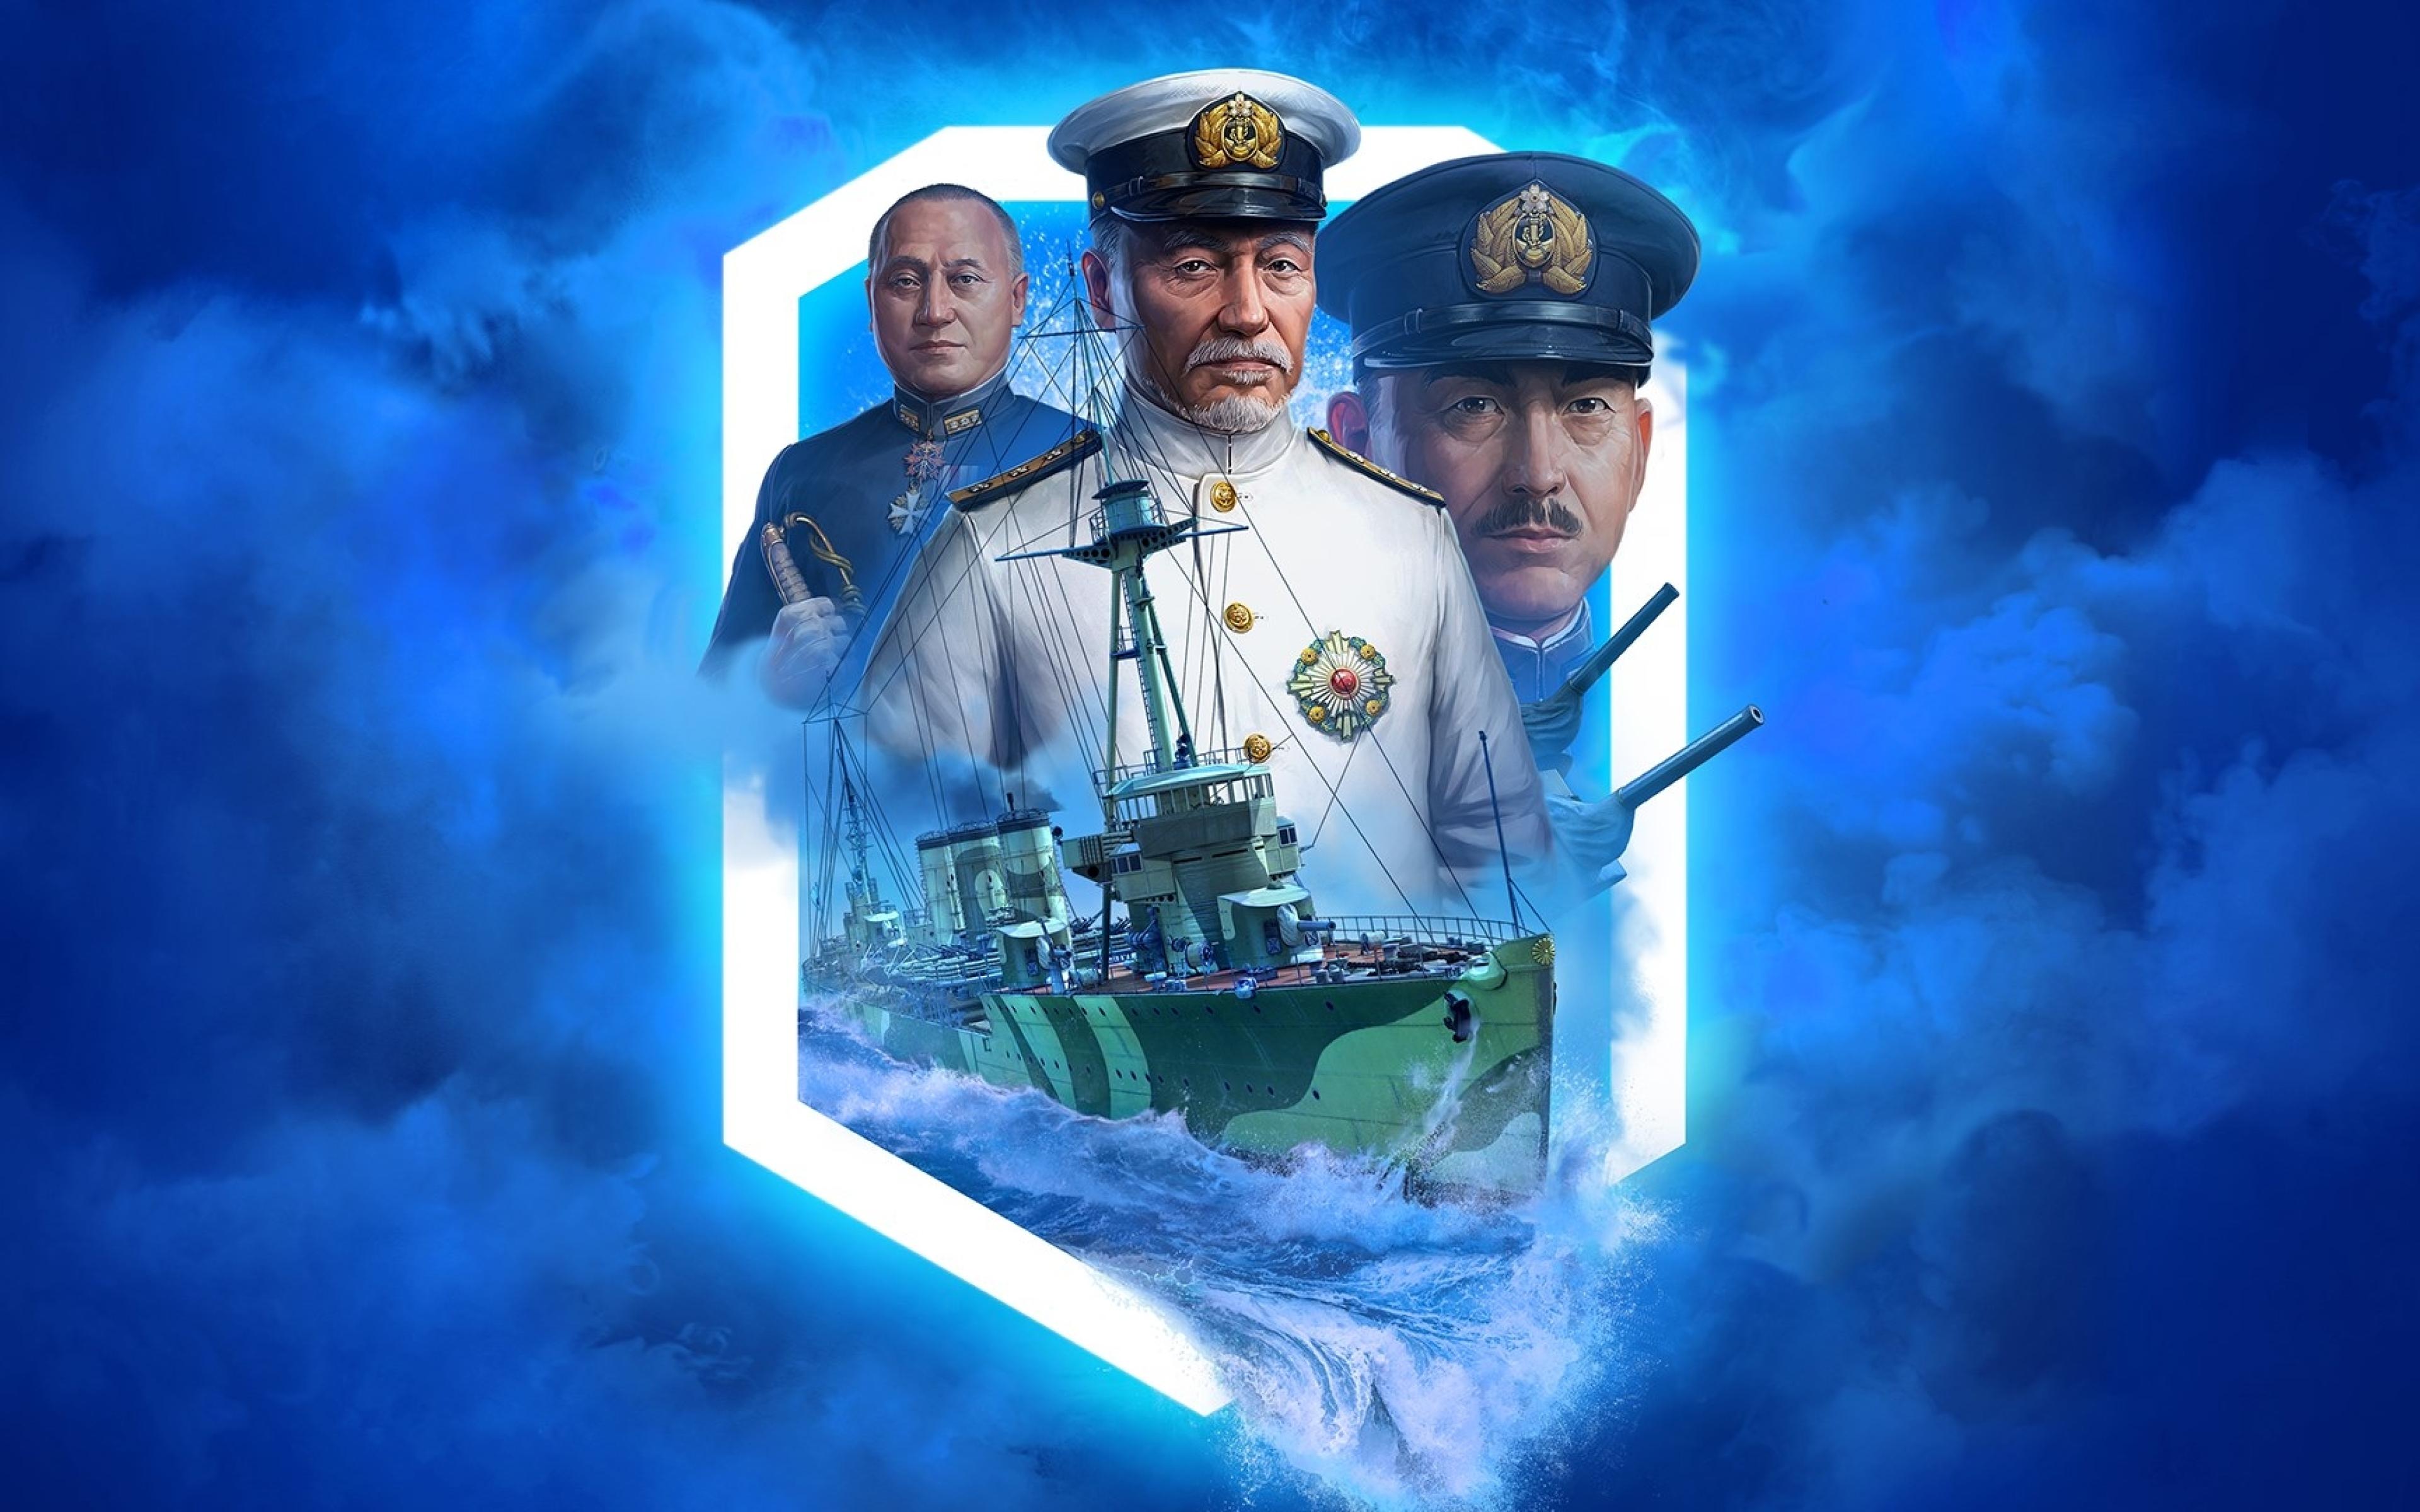 3840x2400 World of Warships Legends UHD 4K 3840x2400 Resolution Wallpaper, HD Games 4K ...